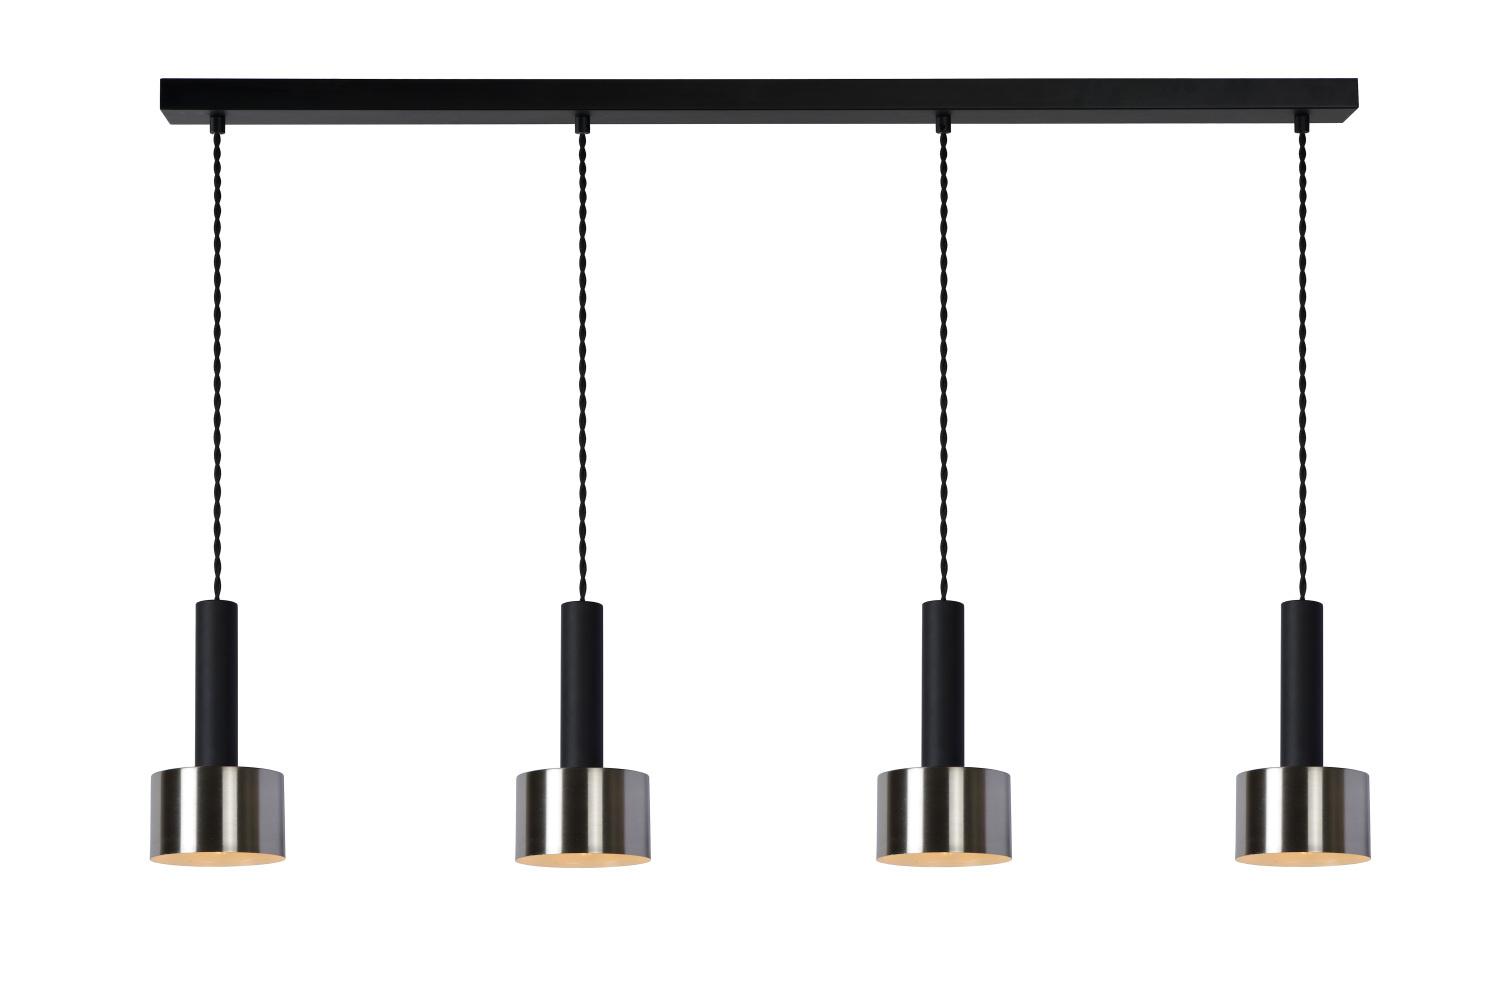 Lucide TEUN Hanglamp-Zwart-4xE27-40W-Staal